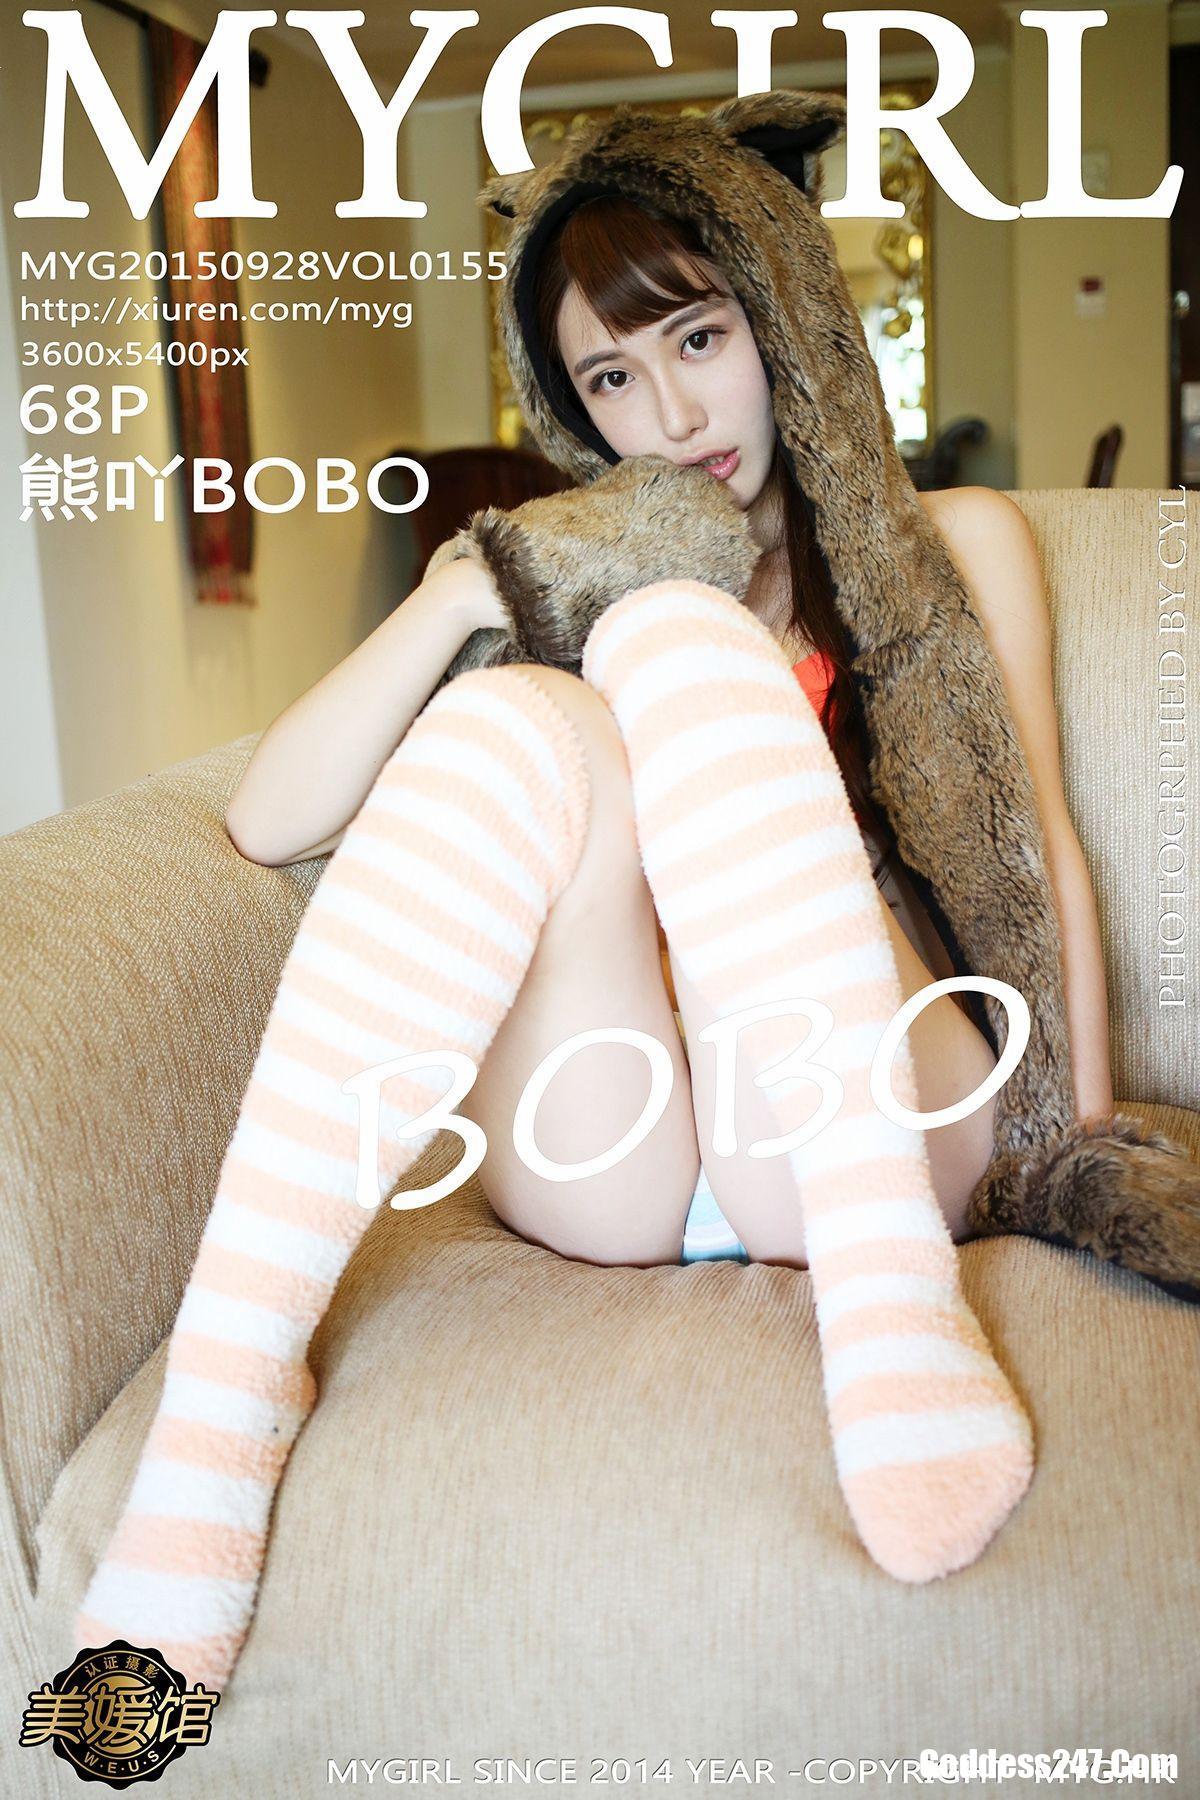 MyGirl Vol.155 熊吖BOBO